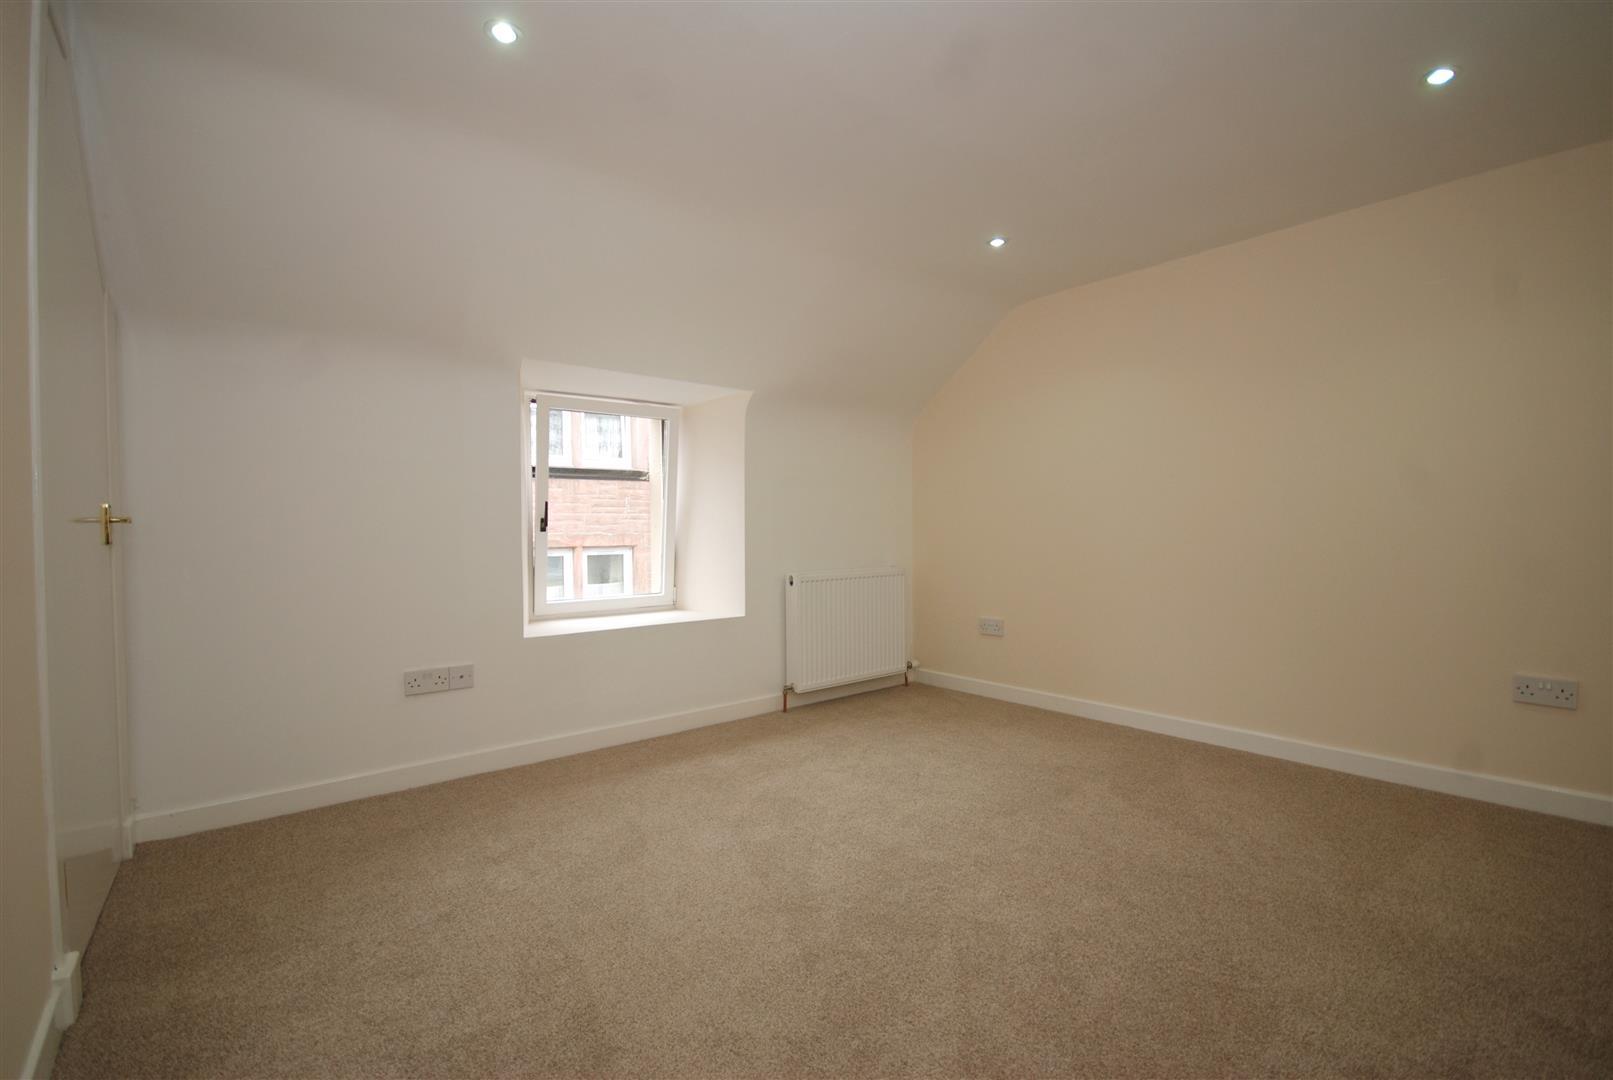 26, Millar Street, Crieff, Perthshire, PH7 3AH, UK